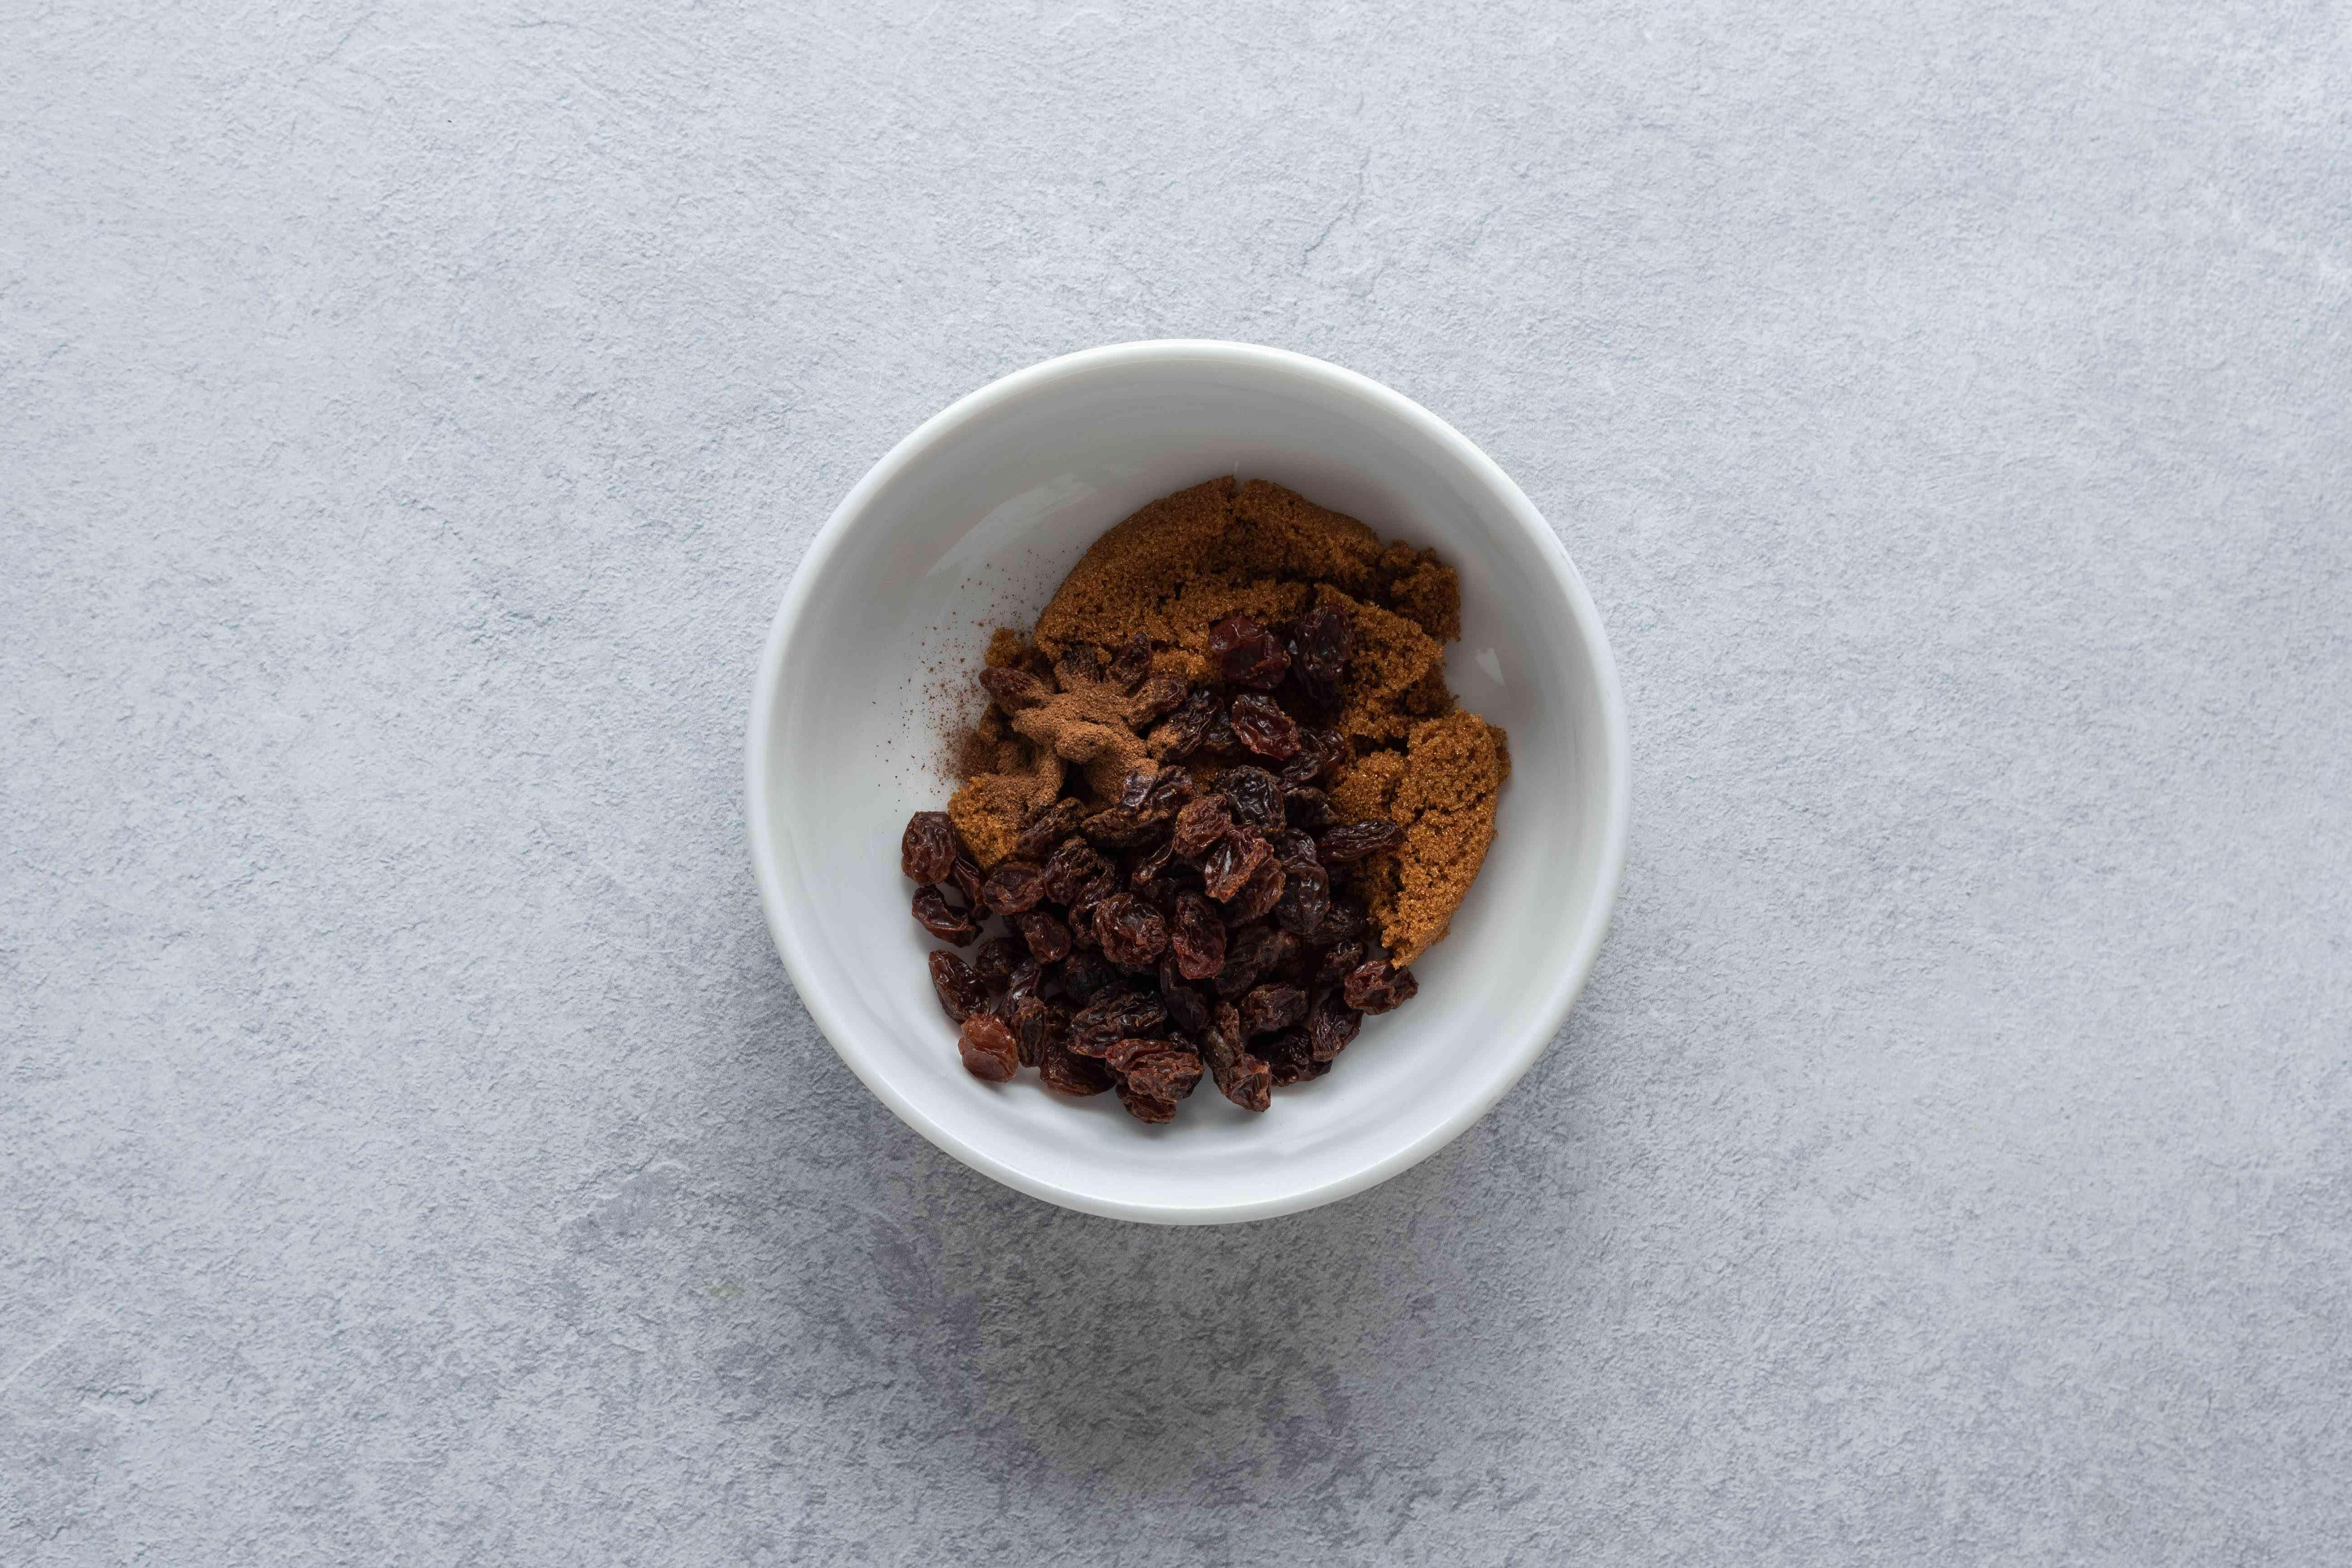 Combine the raisins, brown sugar, and cinnamon in a bowl